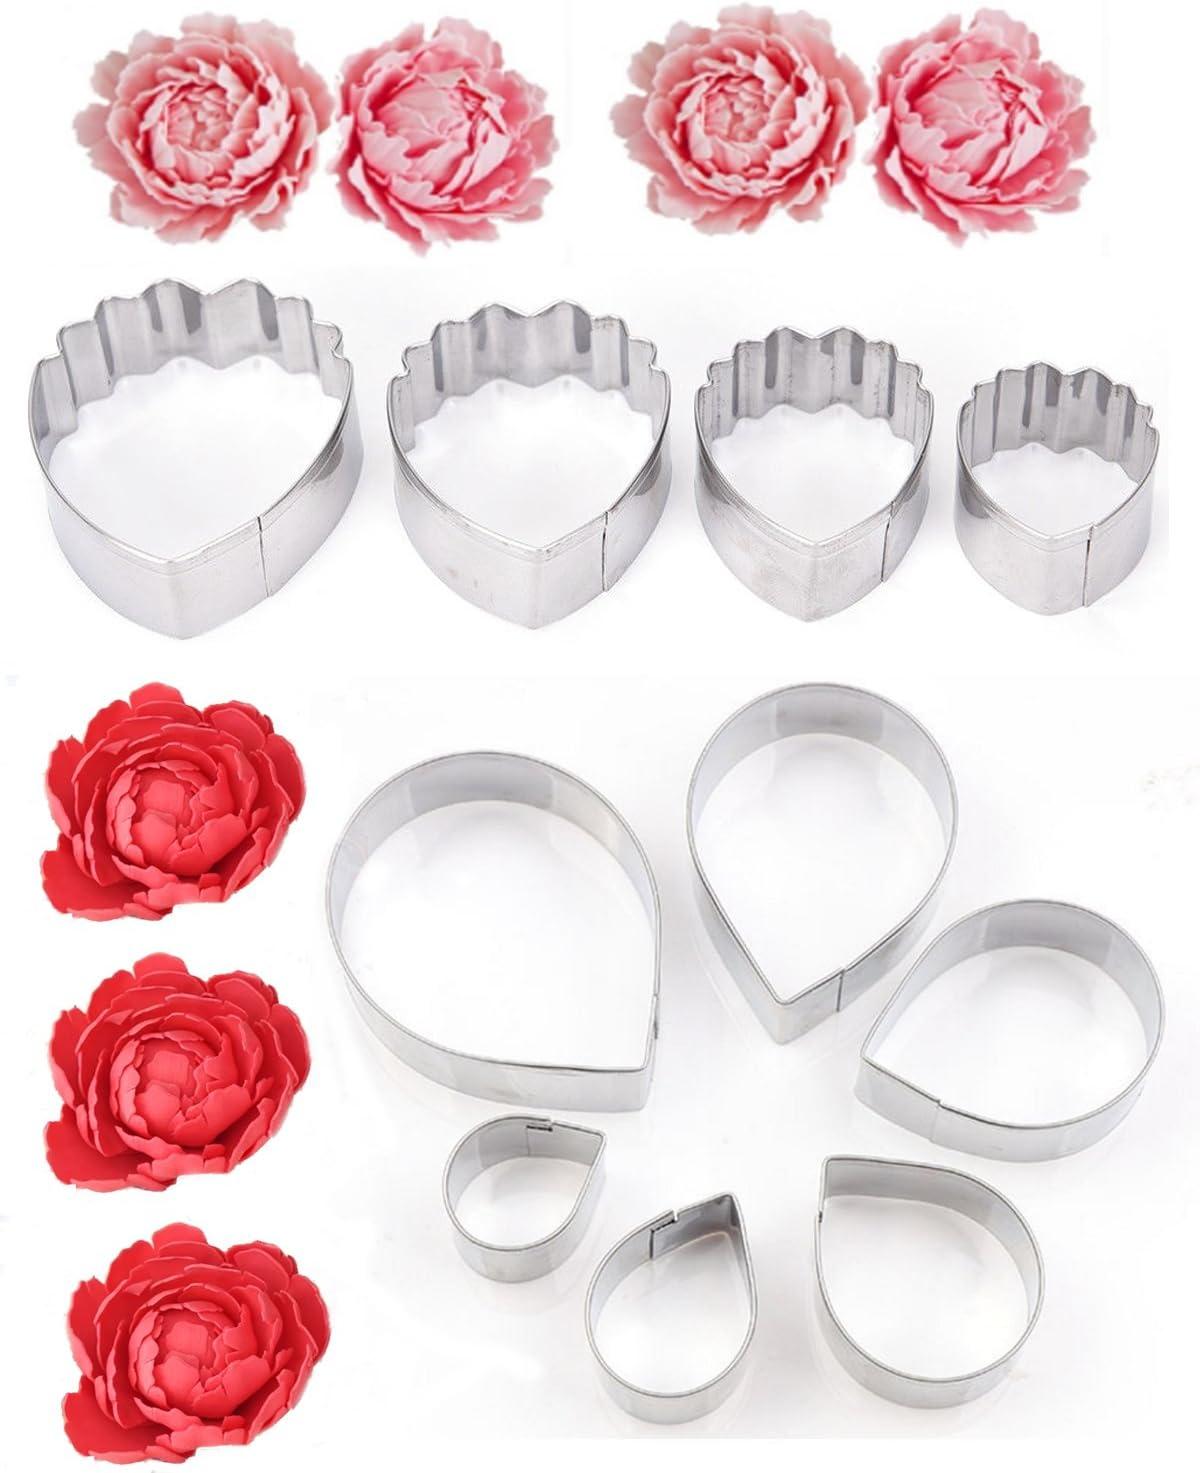 rose motif 5M roll handmade material 4 color assortment roll set of Japanese jacquard ribbon tatamitape durable